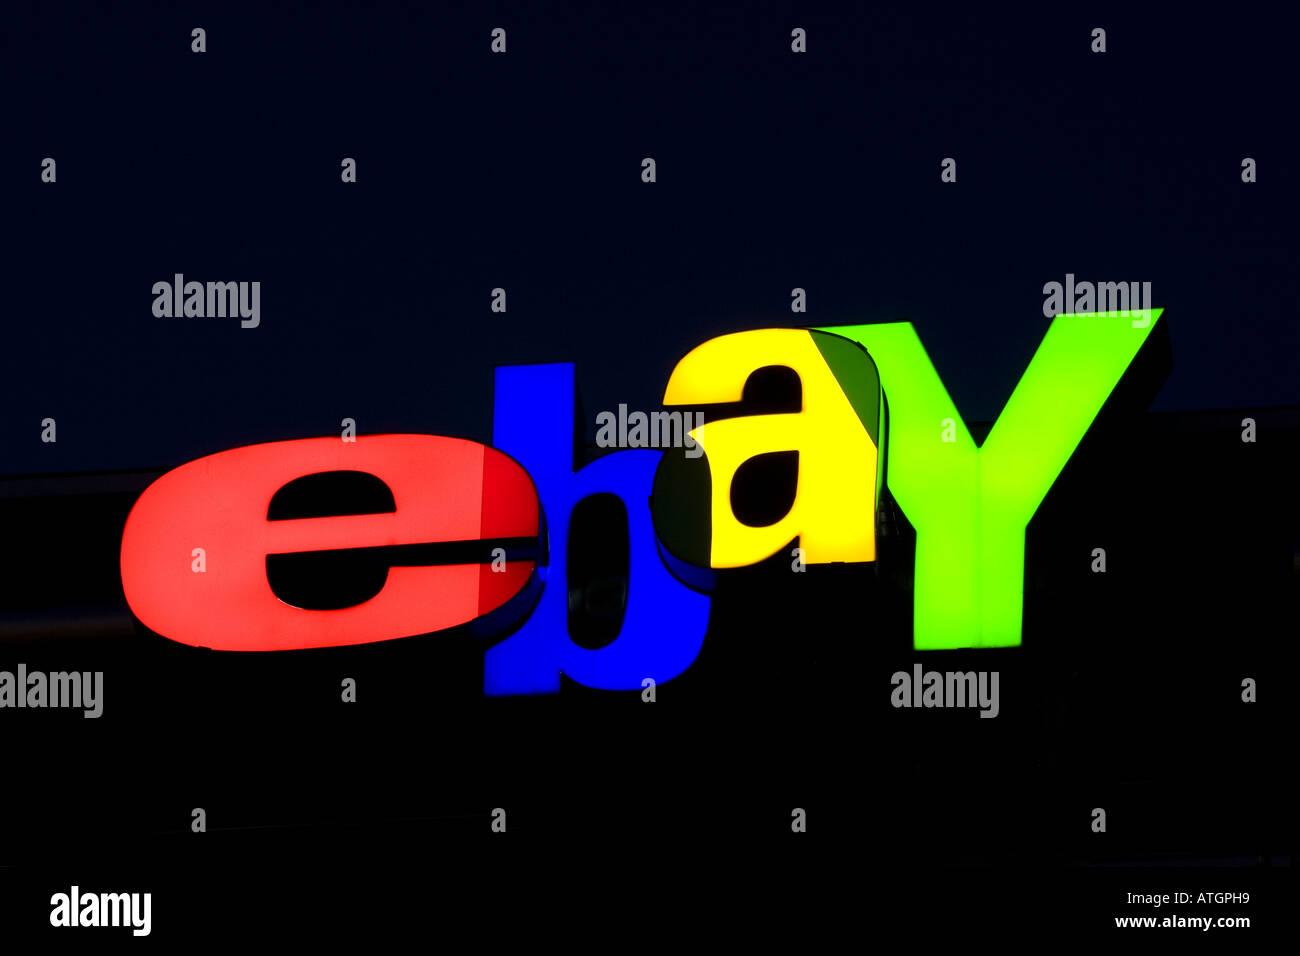 Ebay Symbol Stock Photo 9322648 Alamy